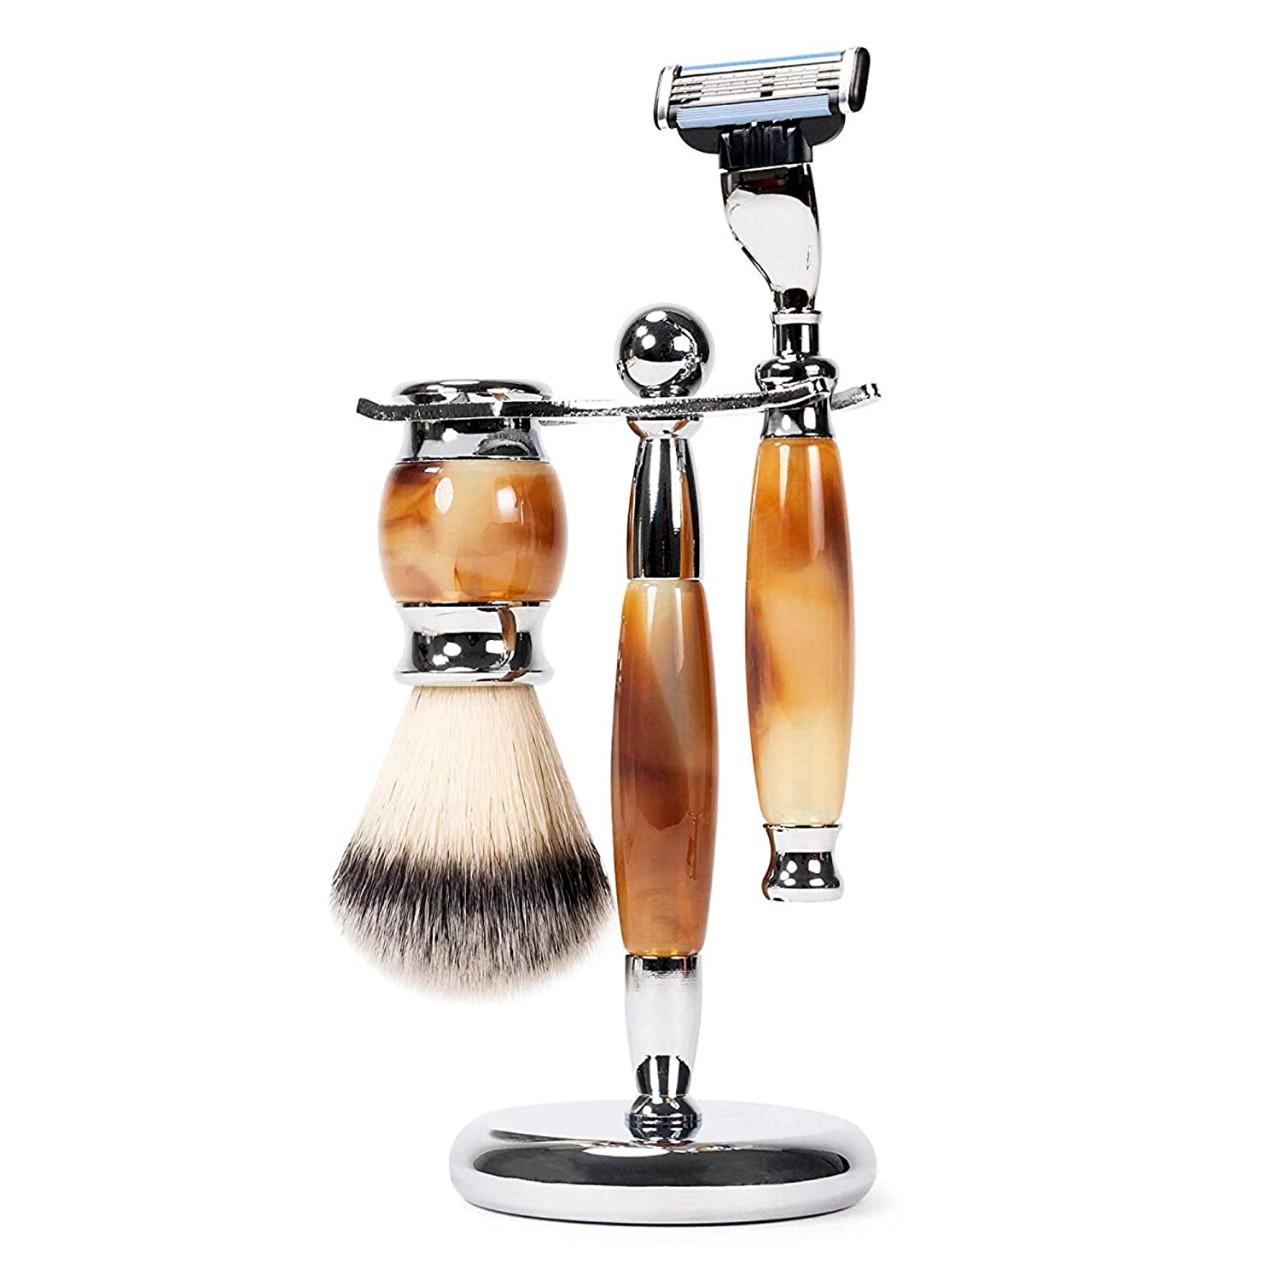 WYZworks Luxury Grooming Set for Men | Real Badger Shaving Brush, Replaceable 3 Blade Razor